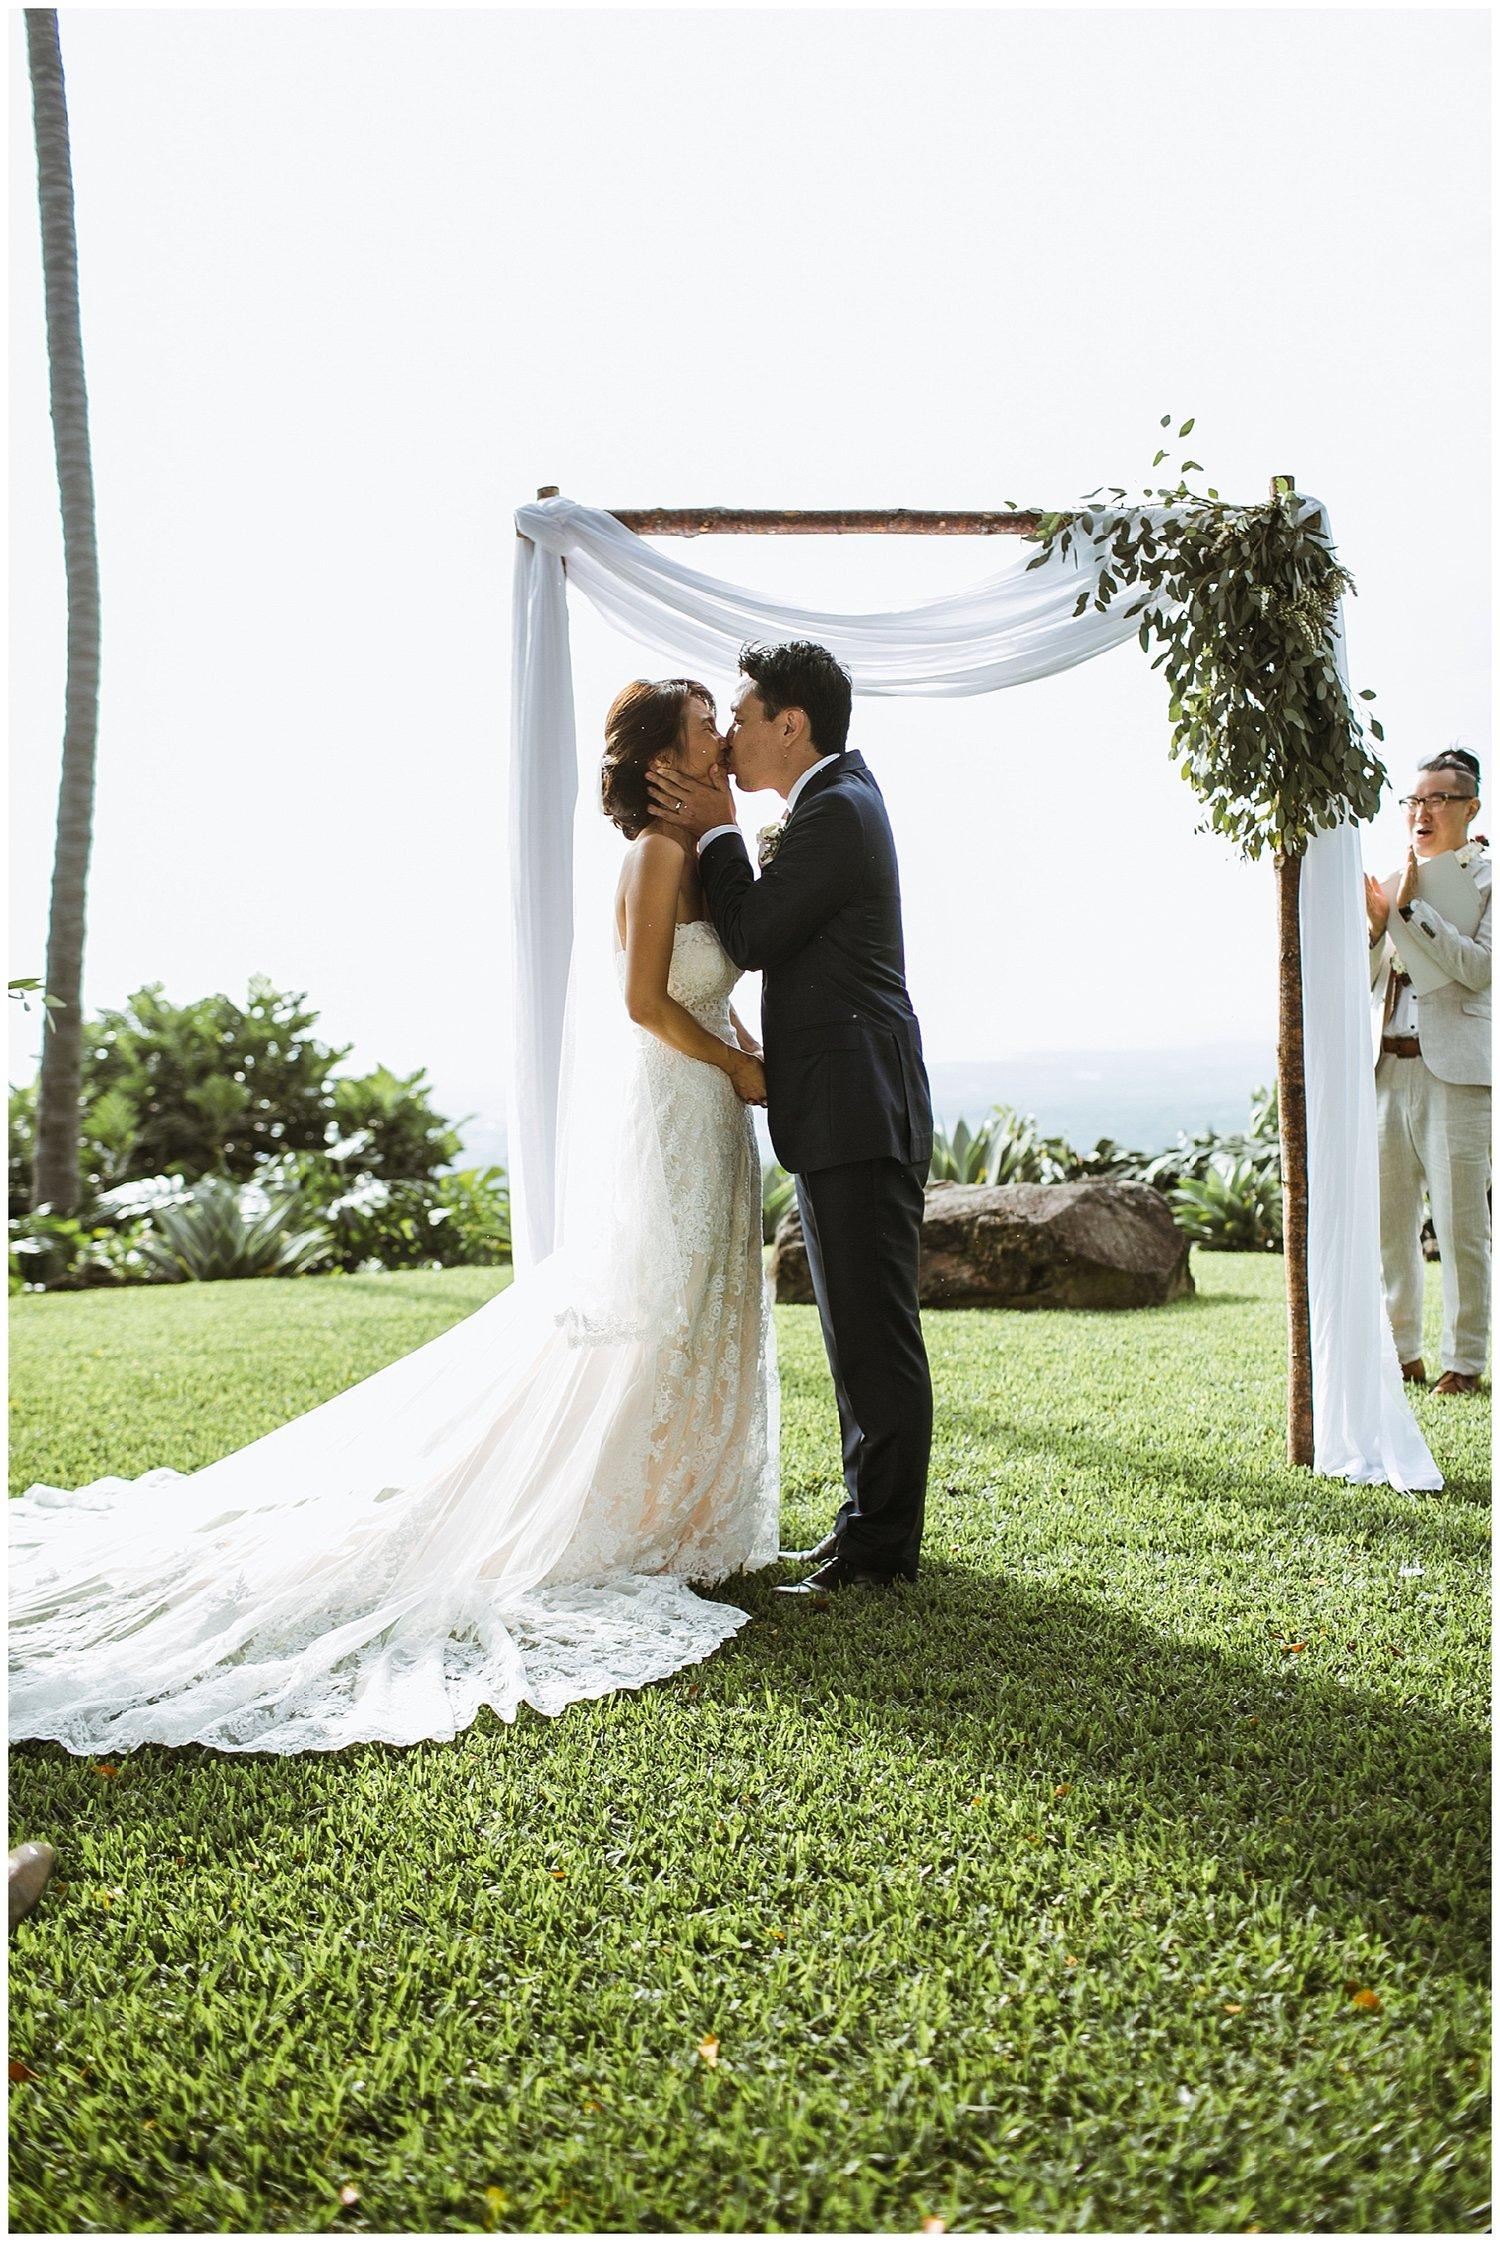 5550e870a4 Bliss in Bloom Kailua Kona Hawaii Wedding Event Coordination 0062.jpg